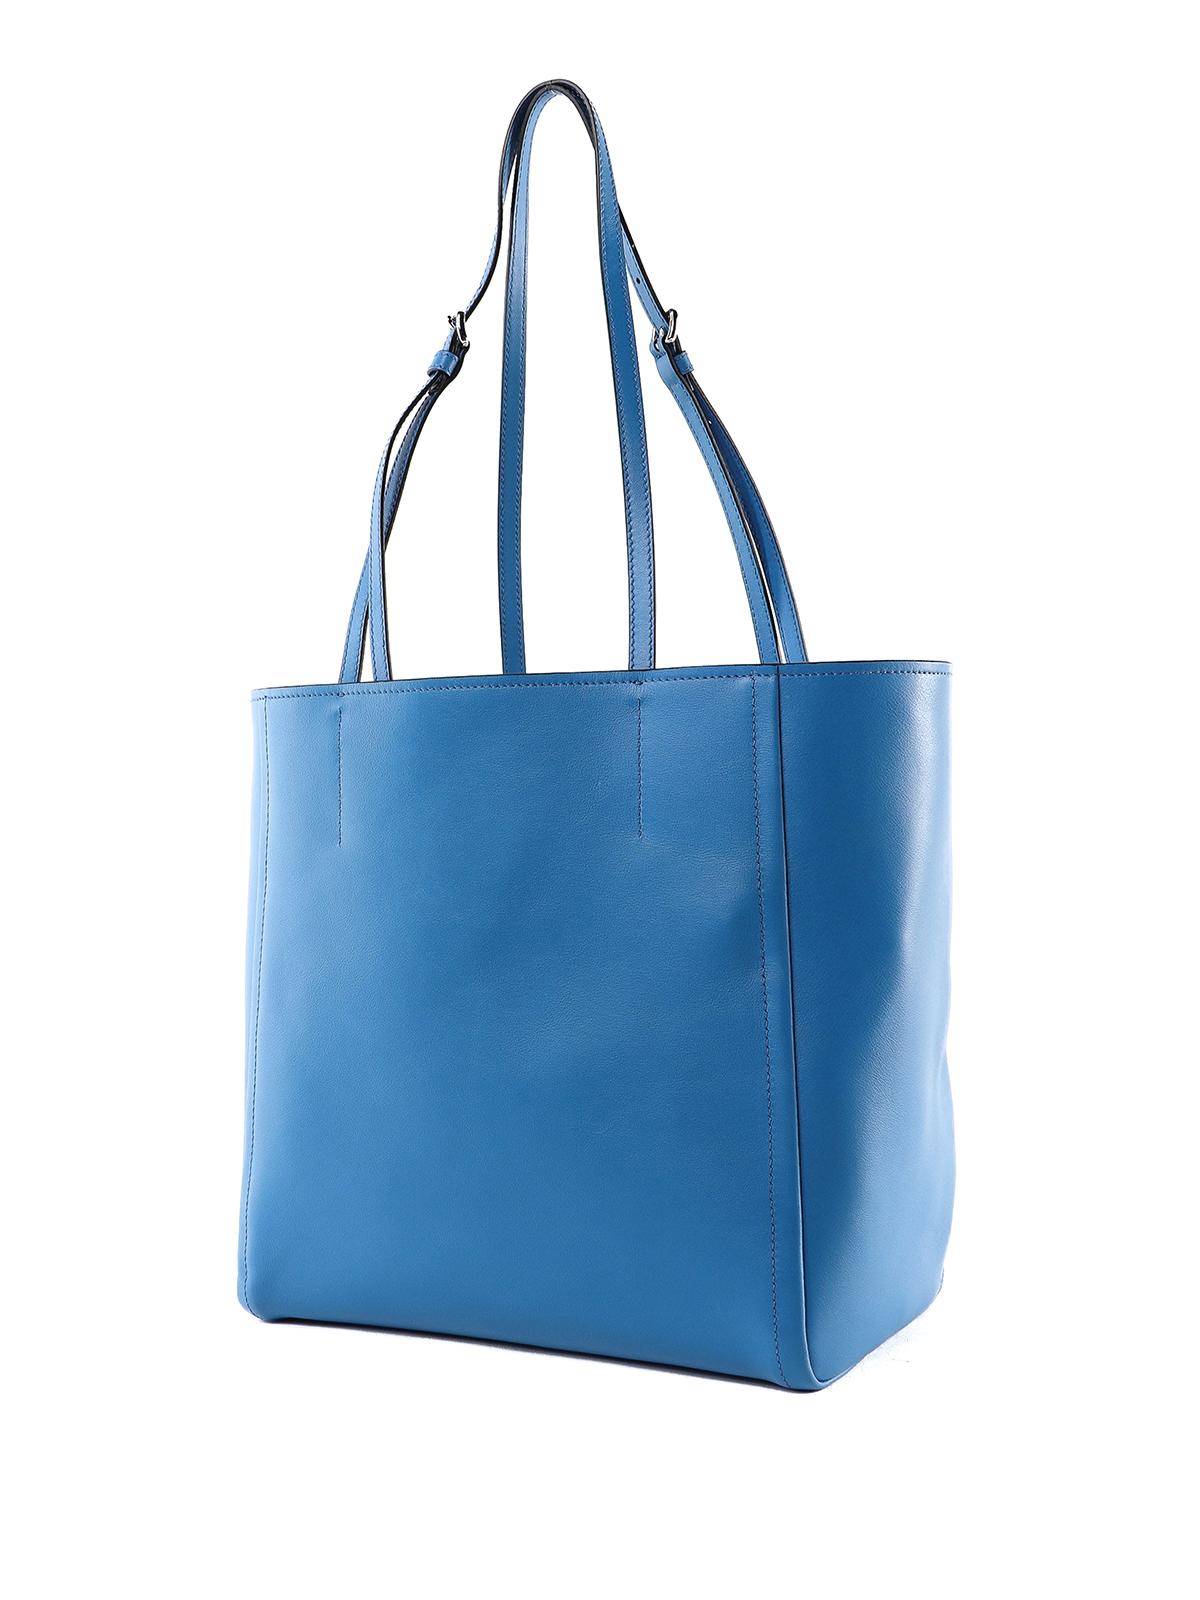 1c3e5f619aae Prada - Concept small leather tote bag - totes bags - 1BG2092B2JYFI